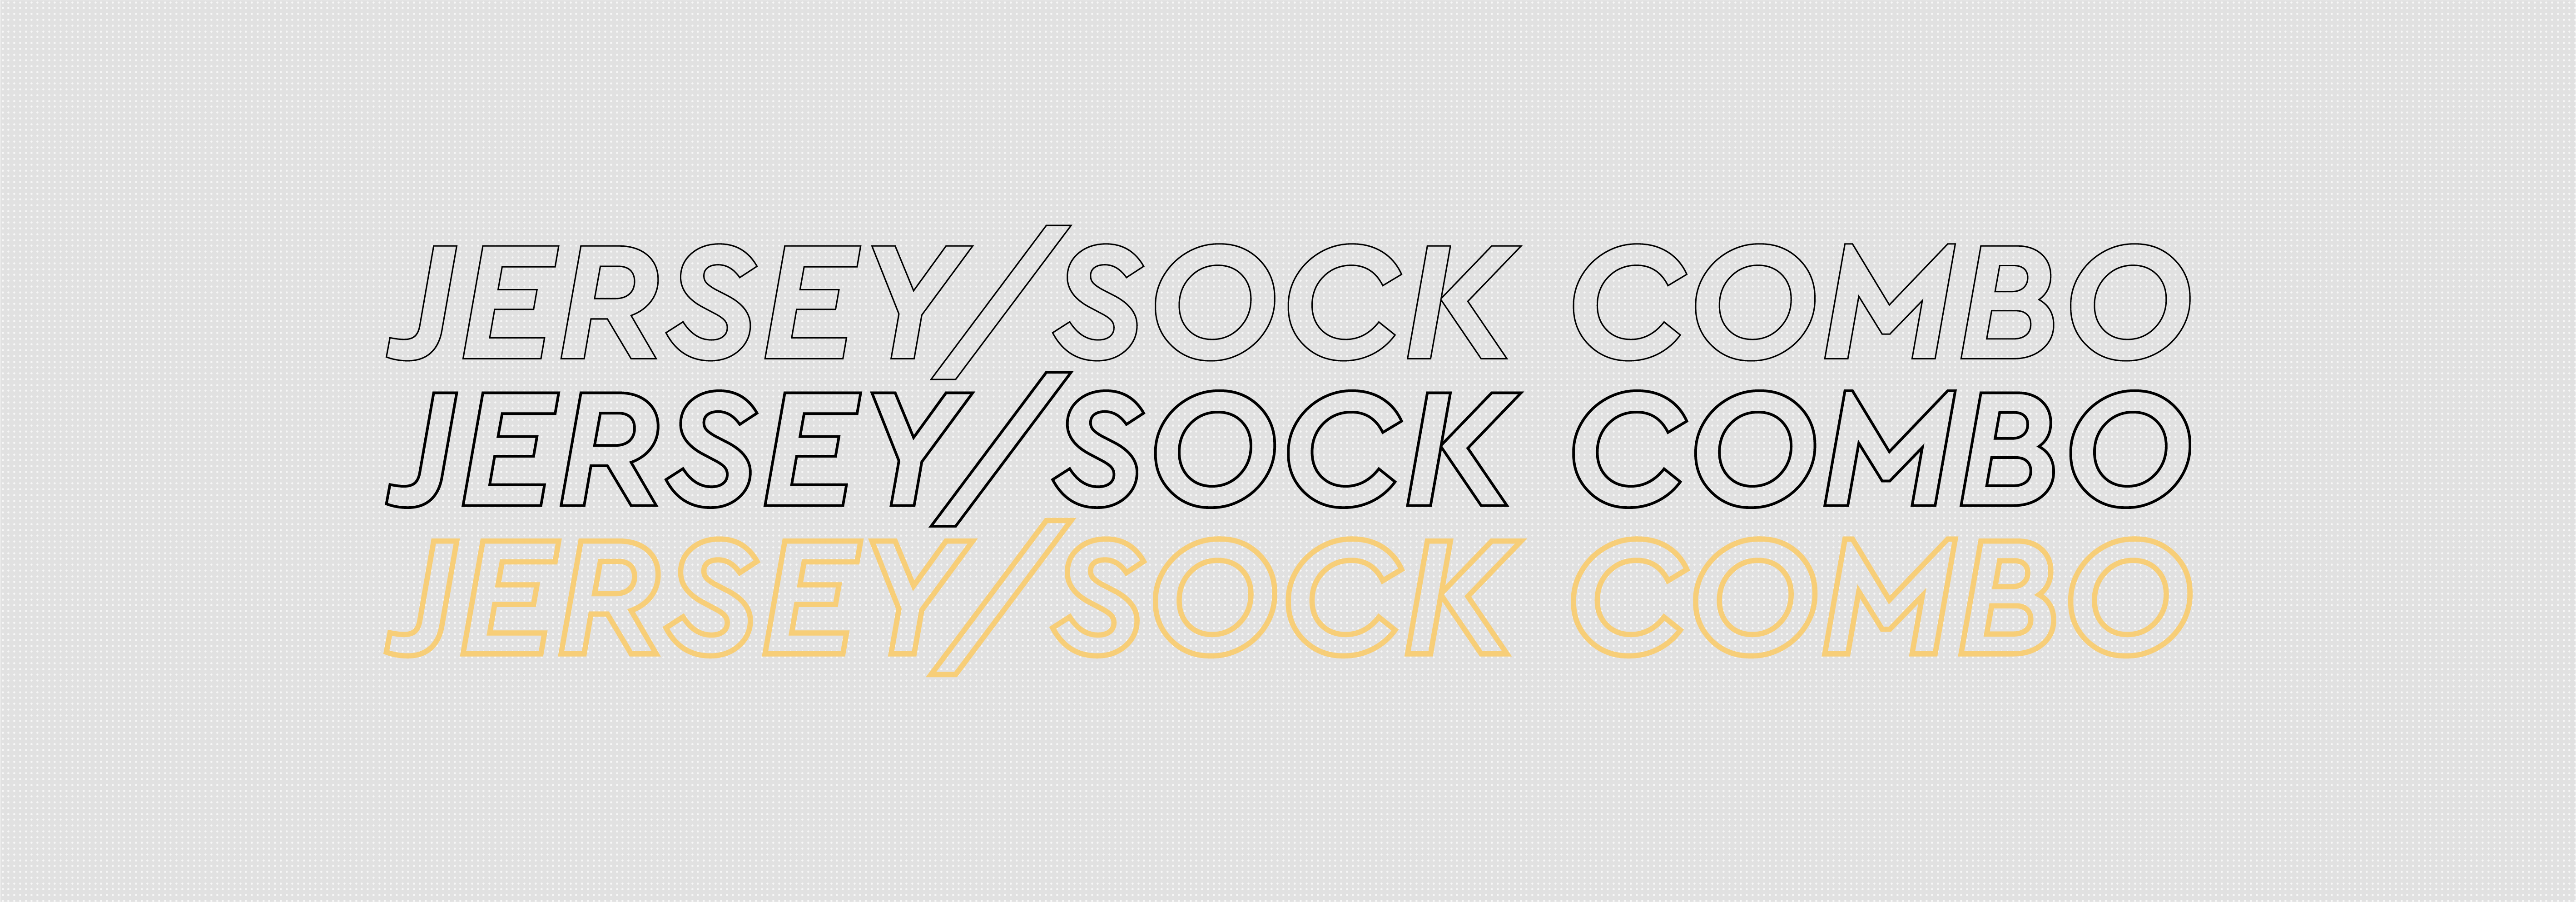 Ozone White Jersey/Sock Combo